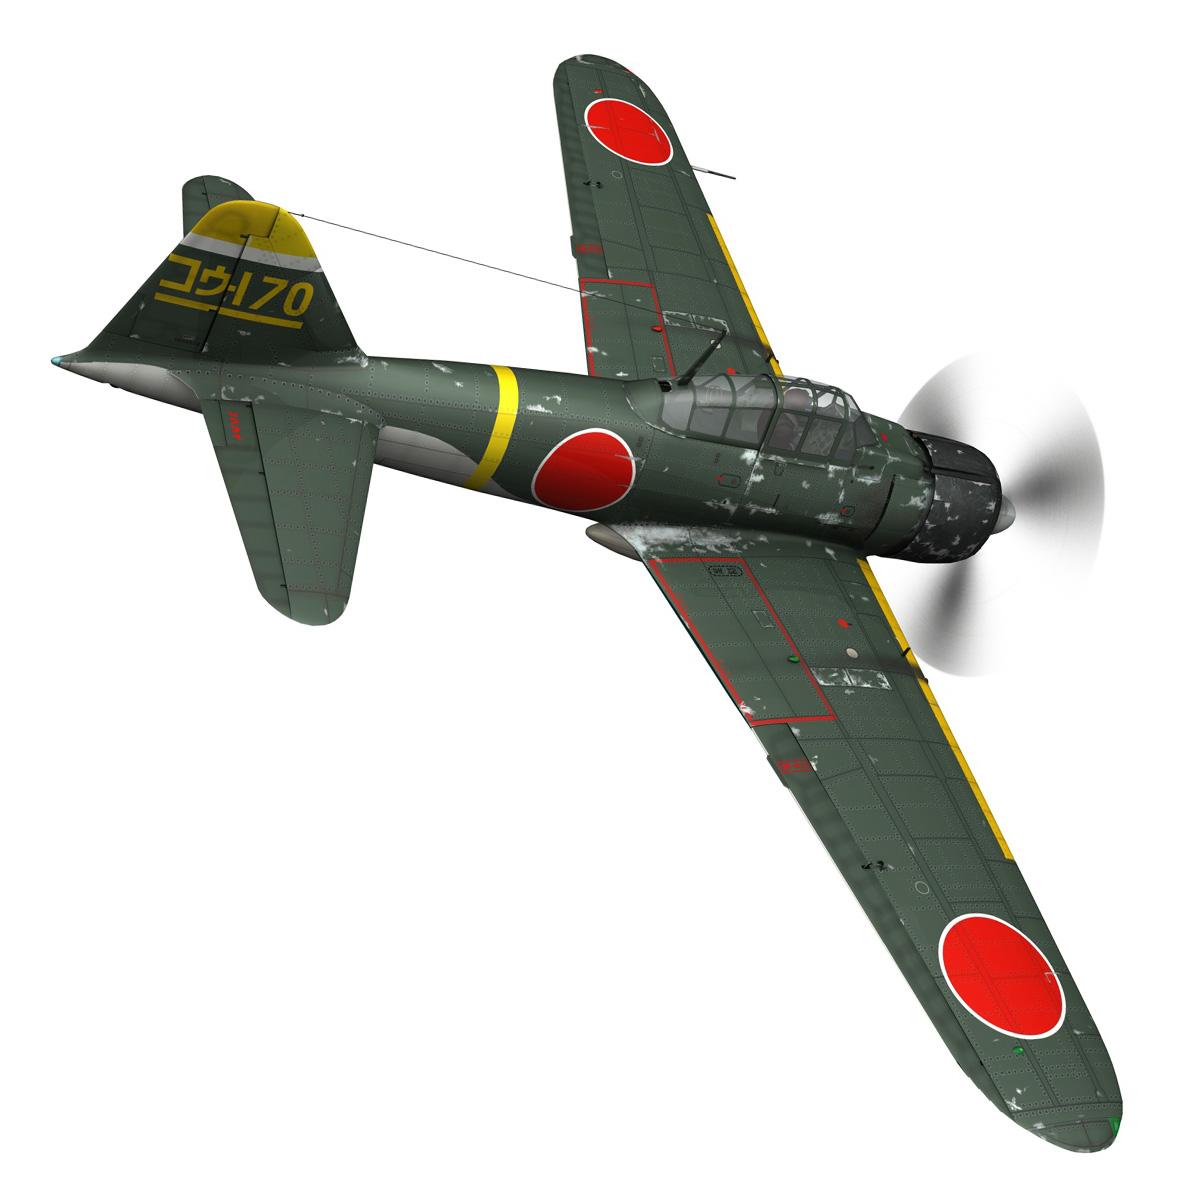 mitsubishi a6m2 zero – konoike kokutai 3d model fbx c4d lwo obj 274339